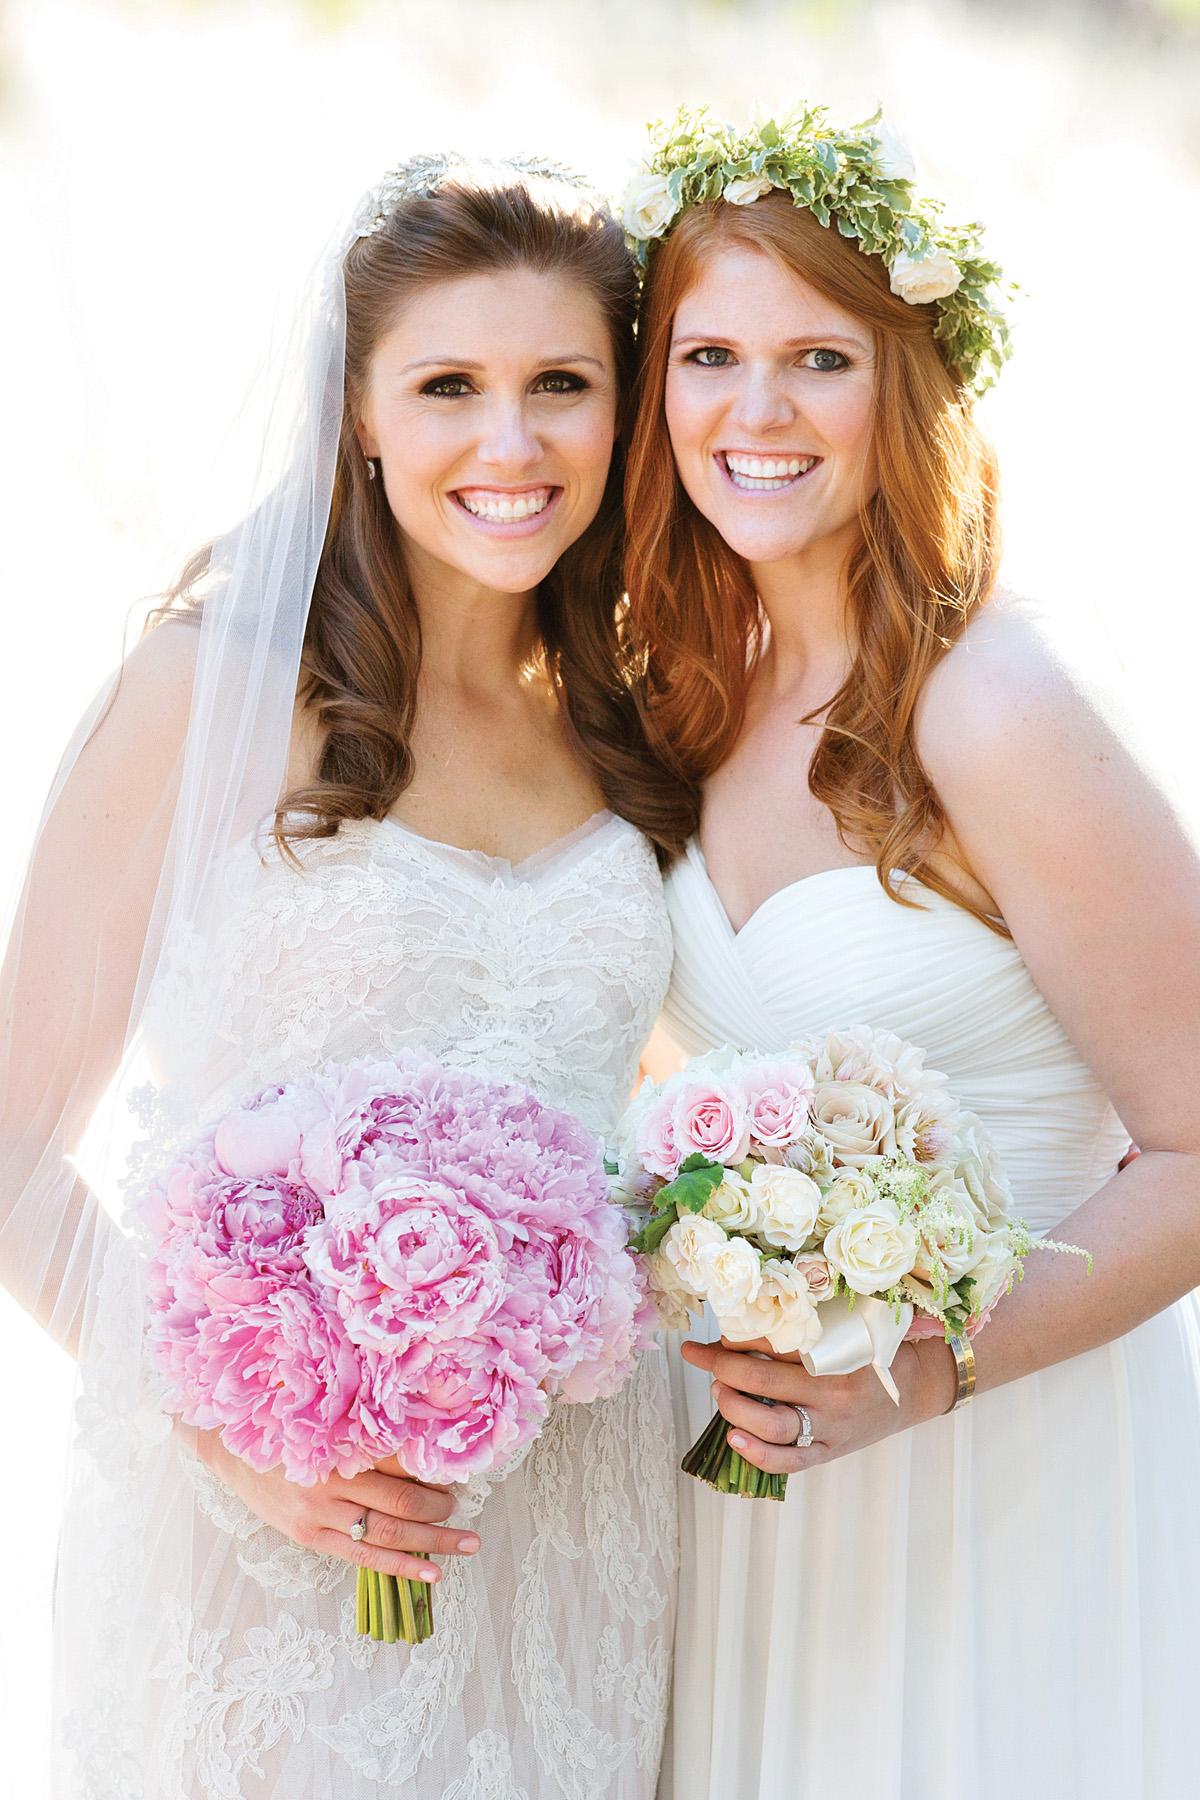 Bride in flower crown with pink wedding bouquet sister bridesmaid in flower crown